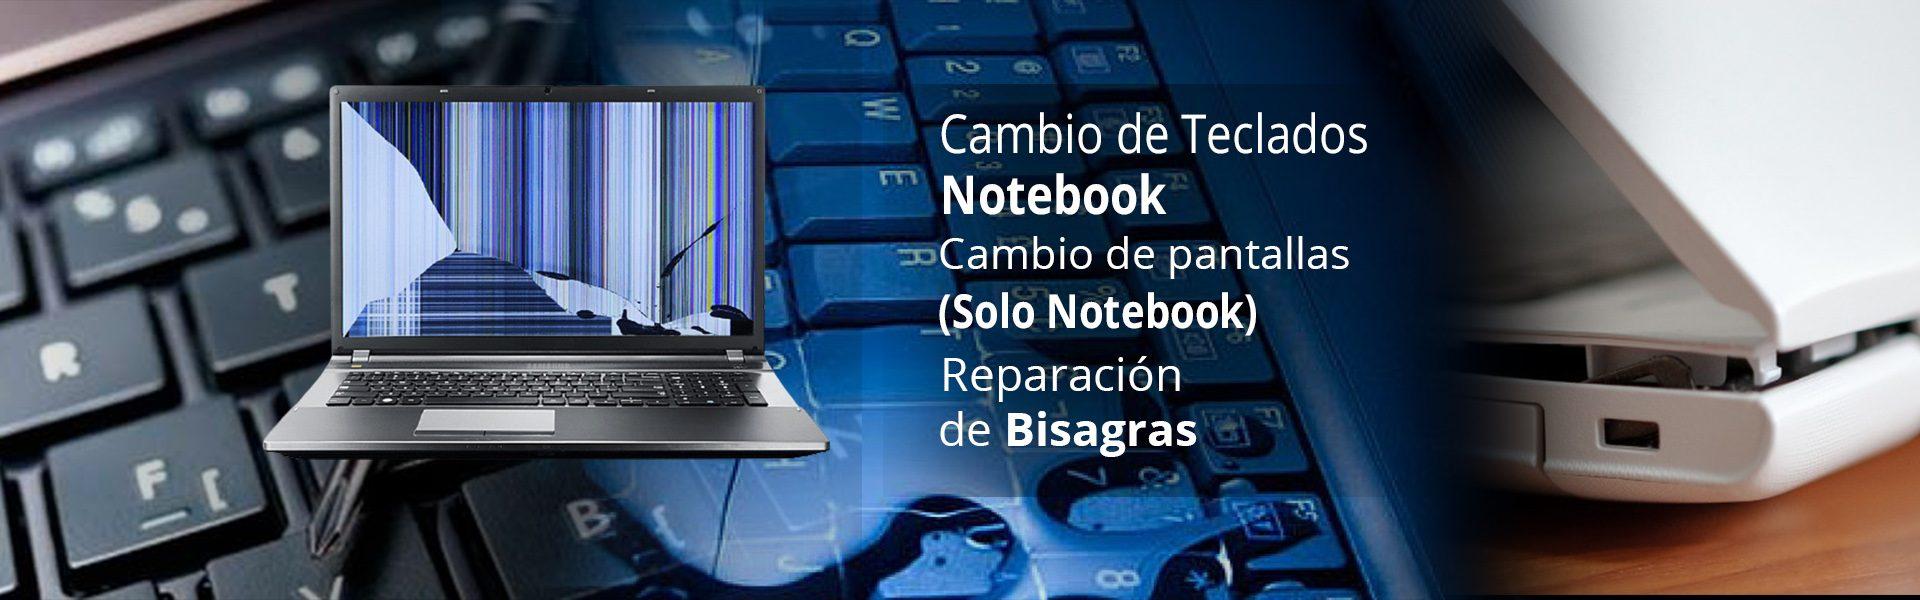 slide_note2